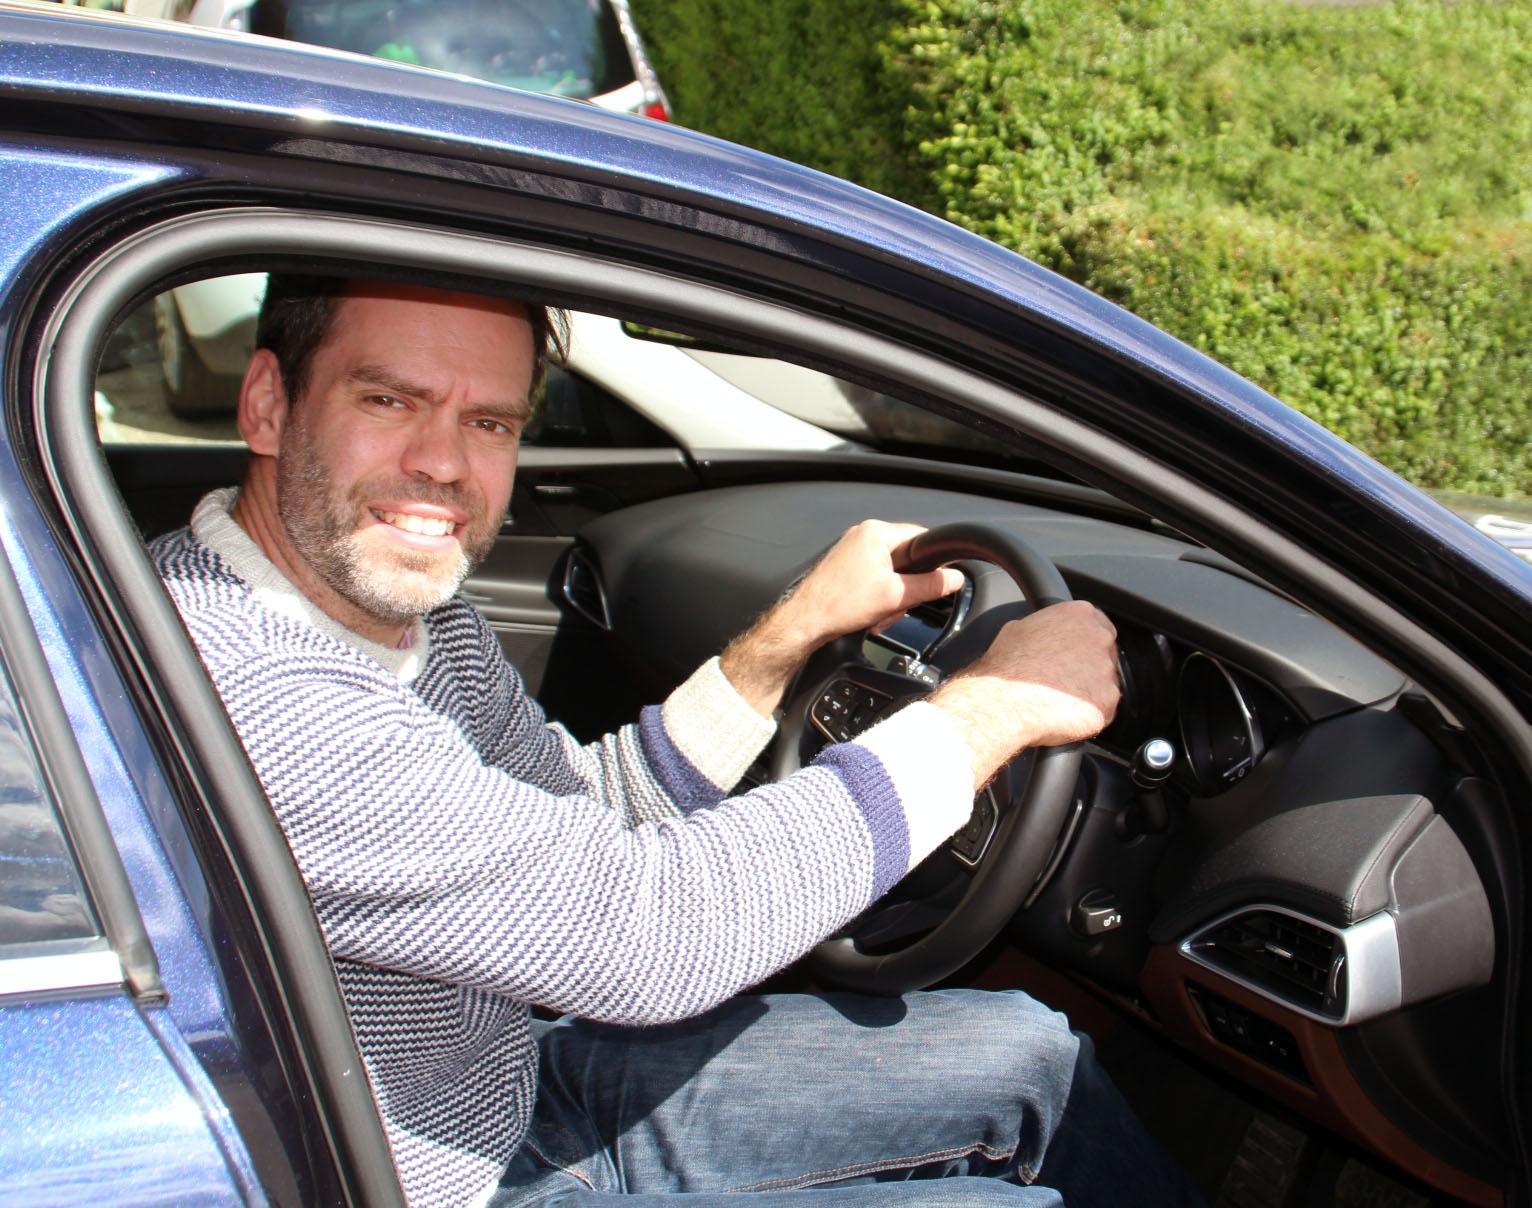 Jaguar, Jaguar XE review, dad blog uk, dadbloguk, school run dad, car reviews, car review